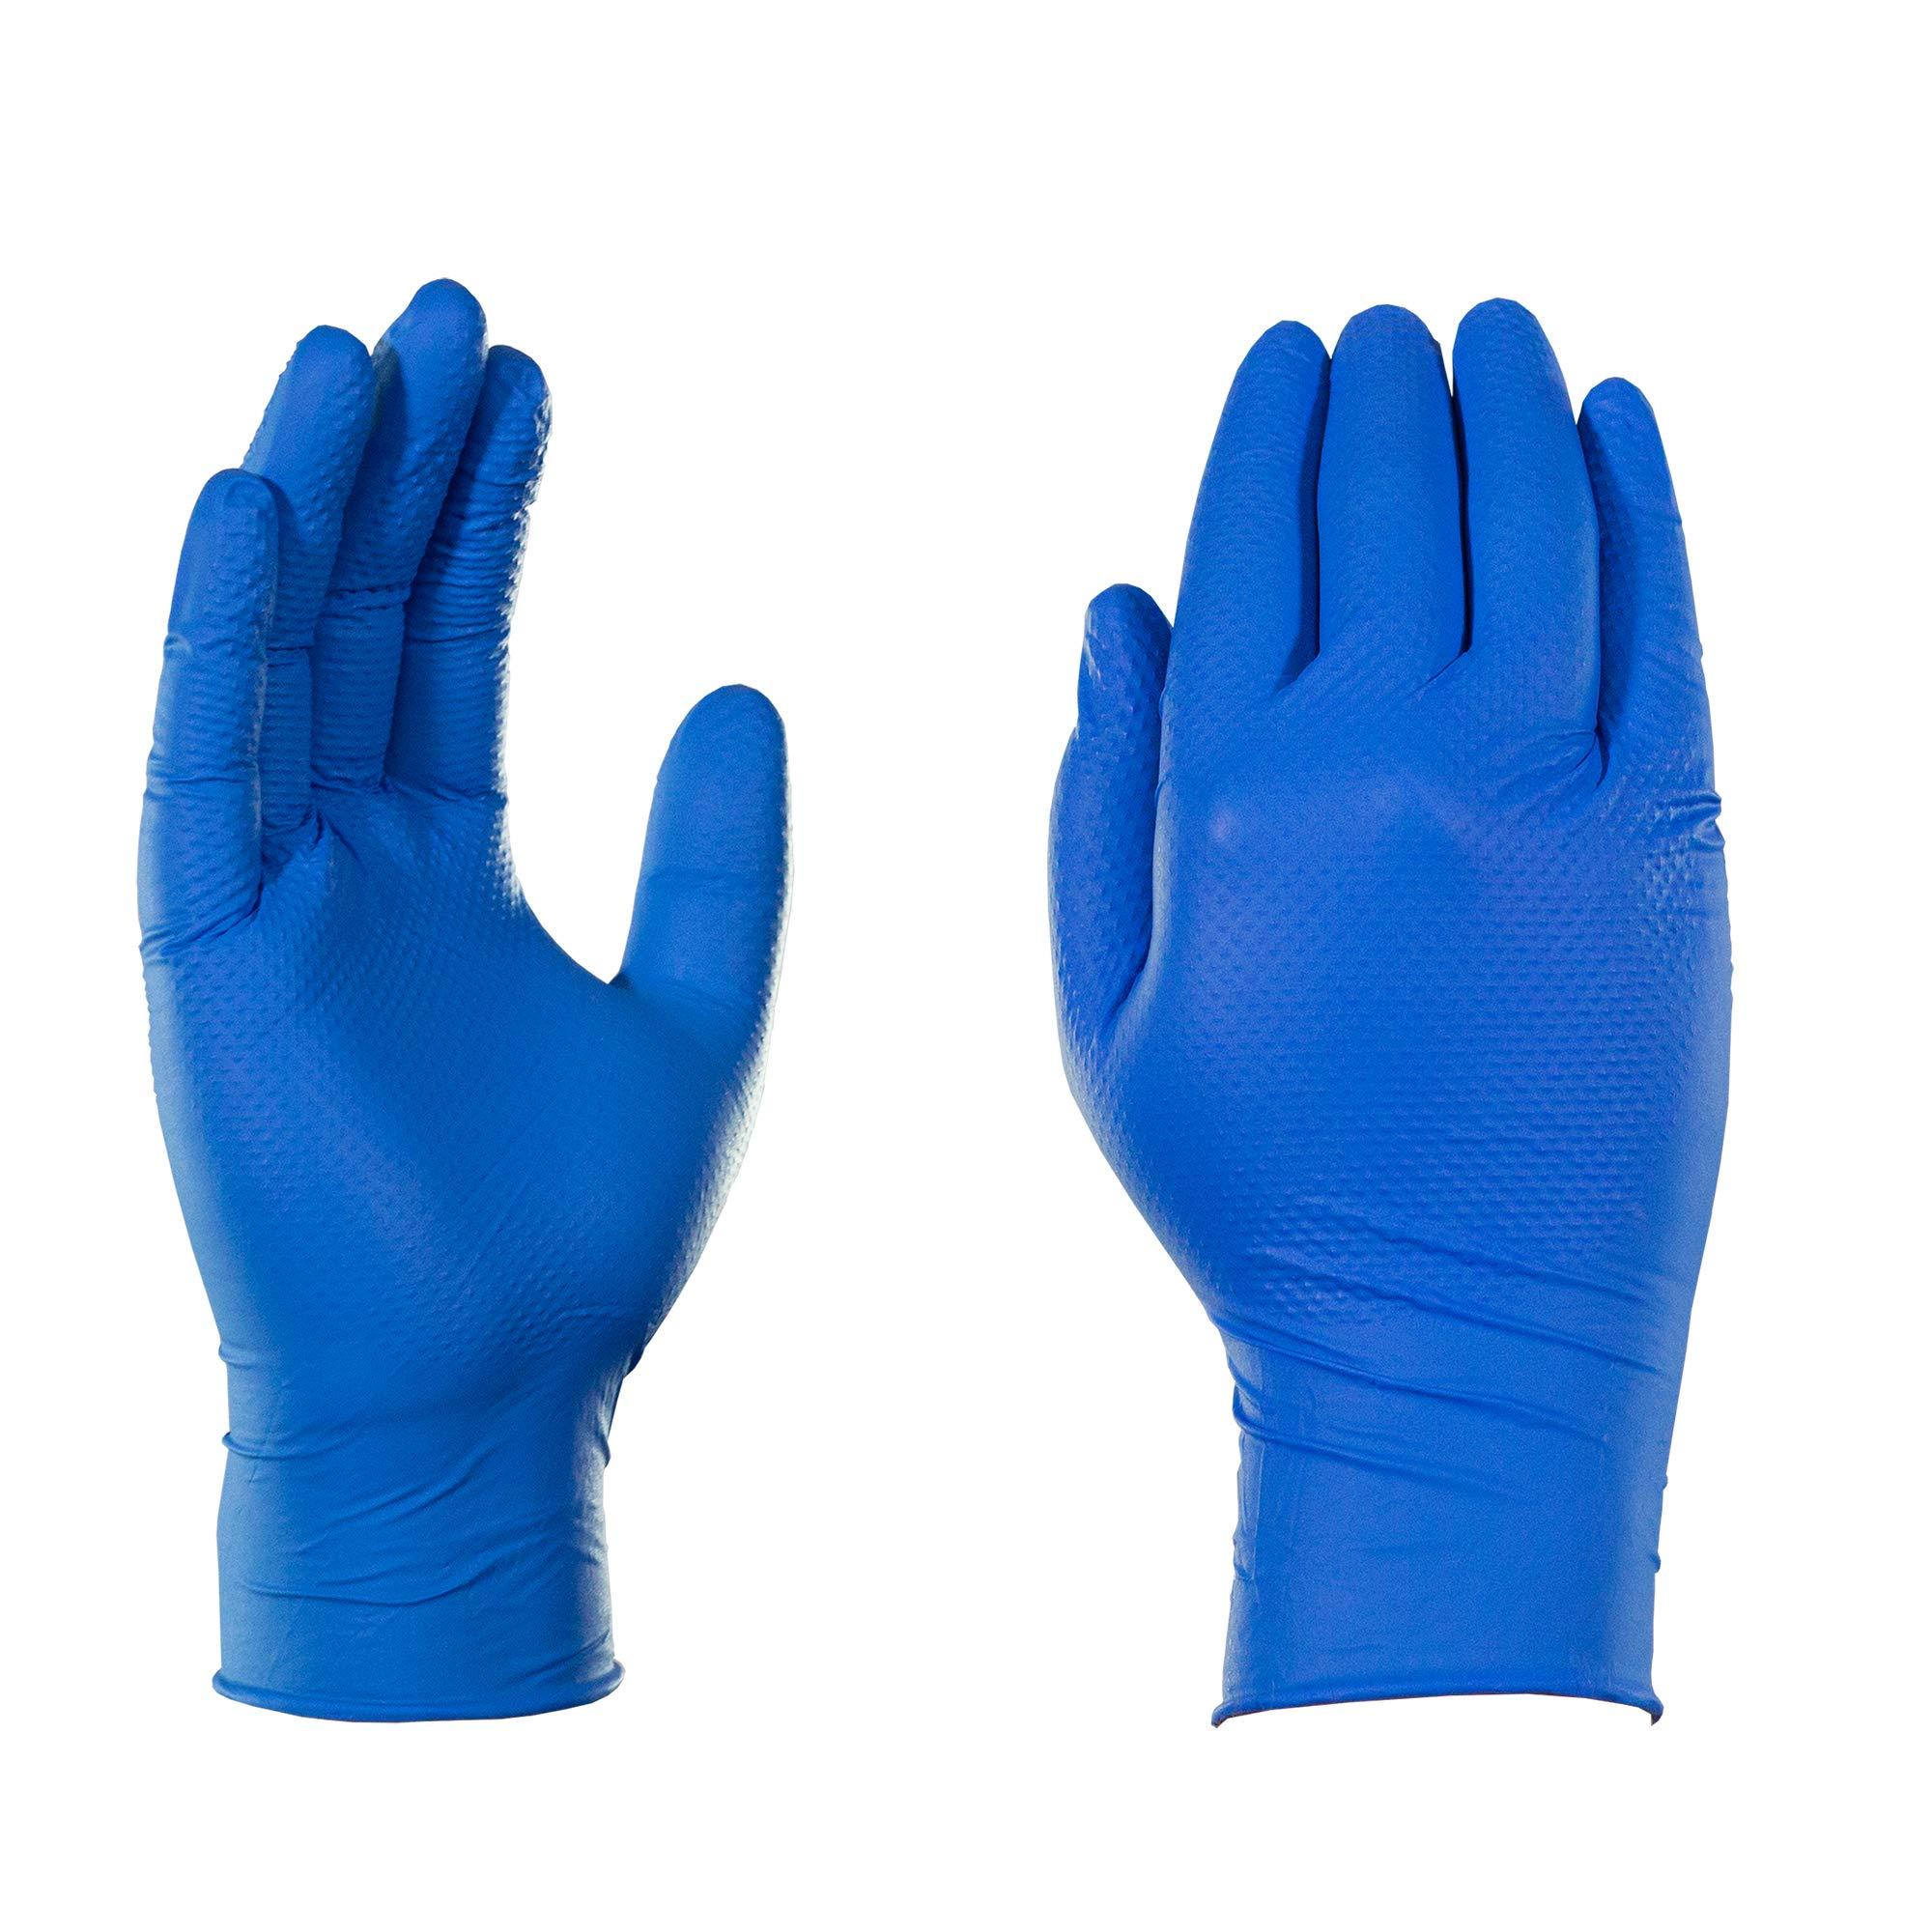 AMMEX - GWRBN49100 - Nitrile Gloves - Gloveworks - HD, Disposable, Powder Free, 6 mil, XXLarge, Royal Blue (Case of 1000)